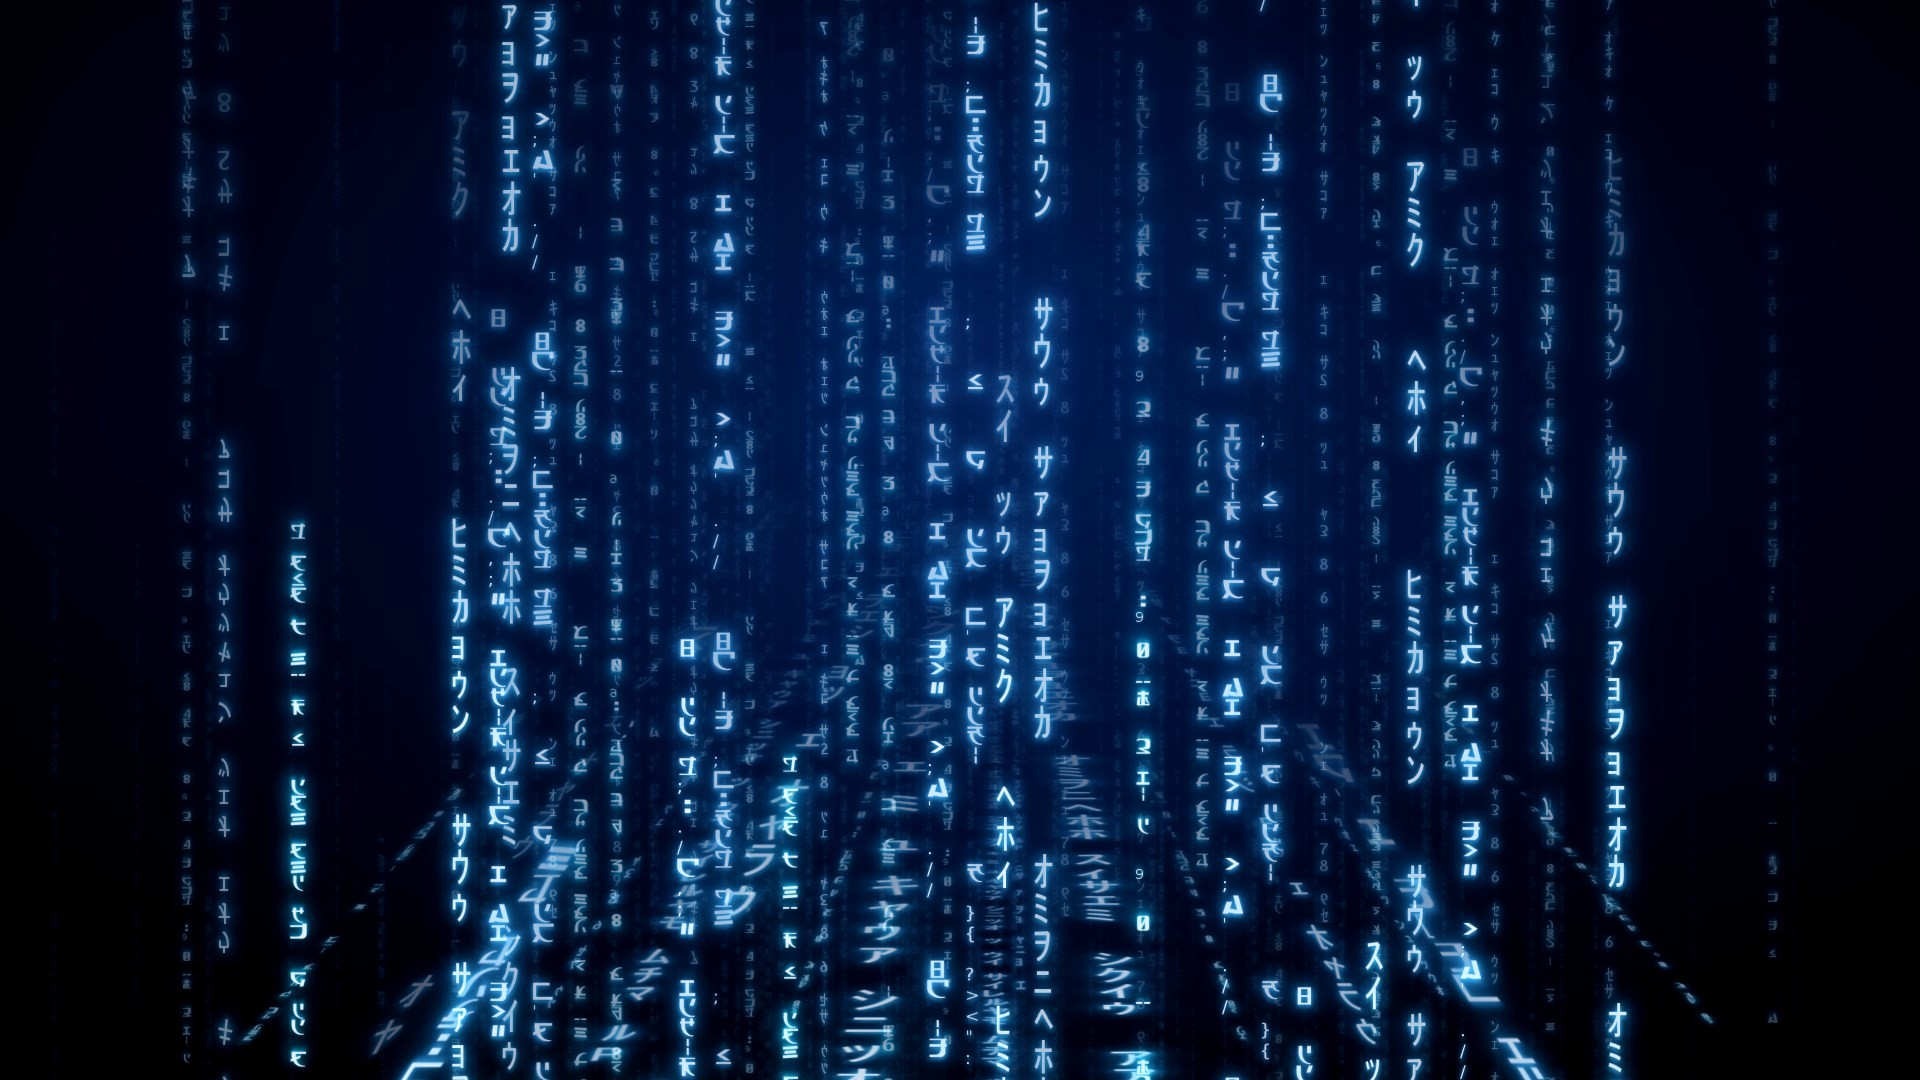 matrix hd widescreen wallpapers for laptop